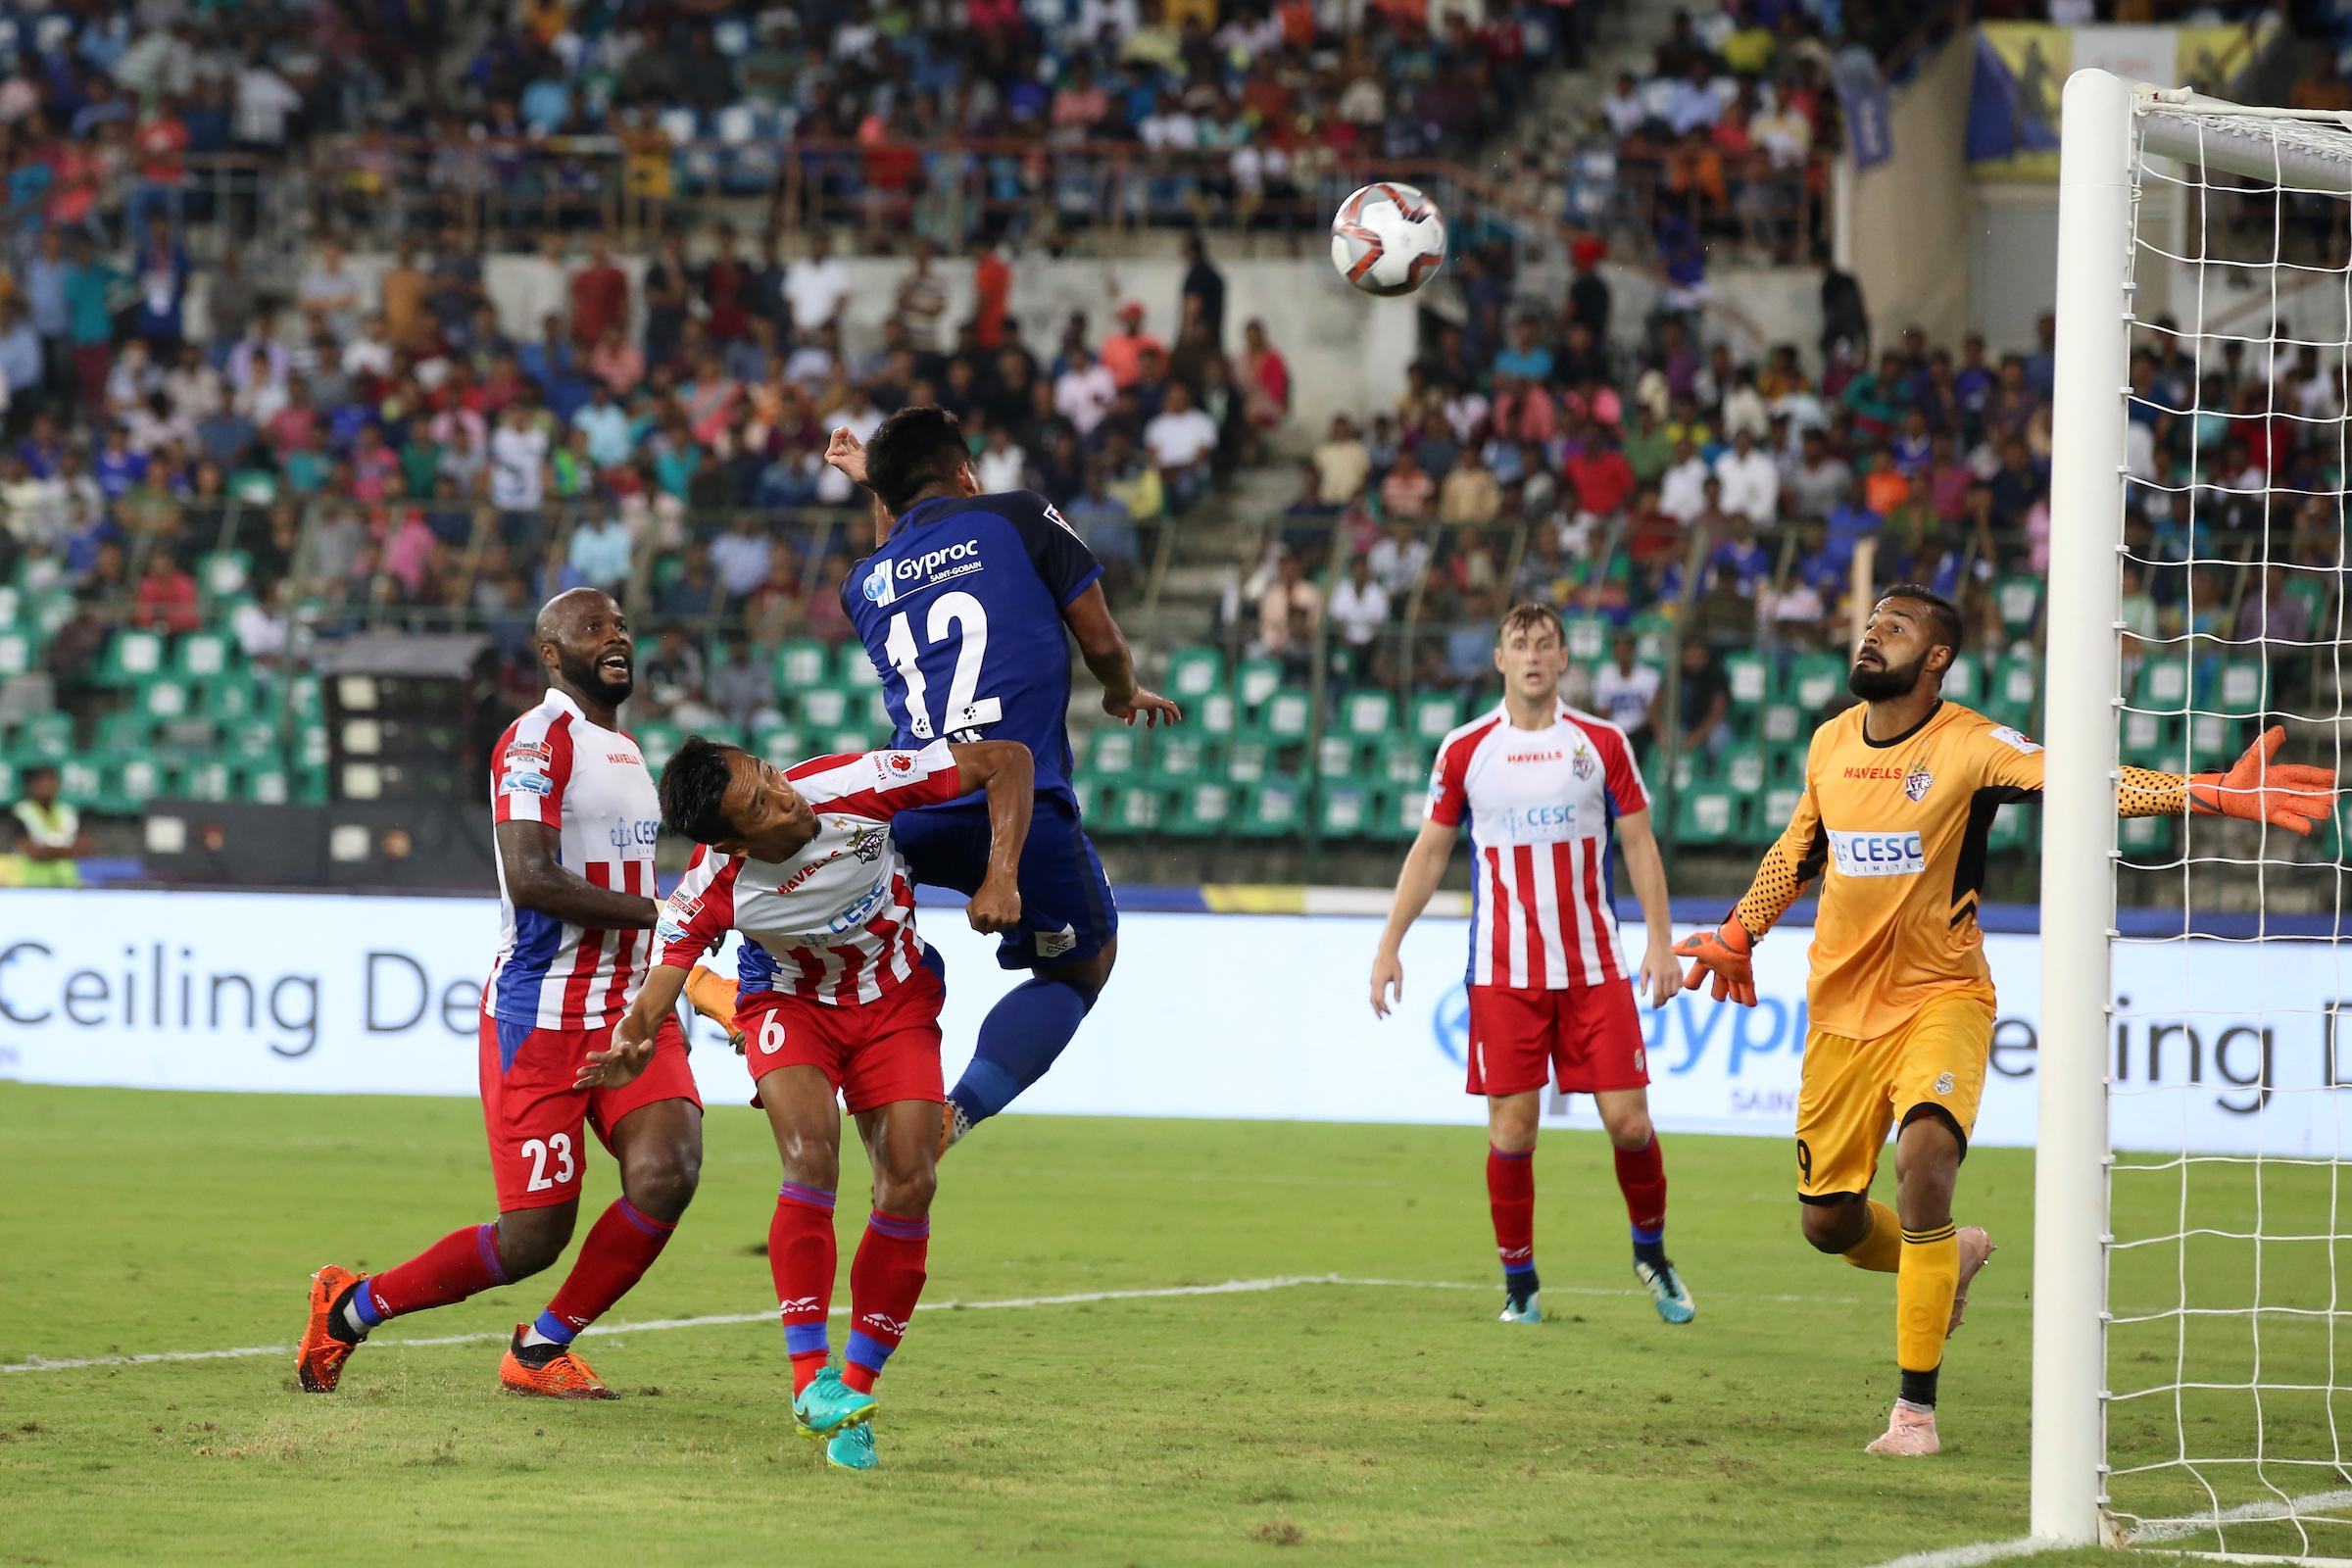 Jeje Lalpekhlua Chennaiyin FC ATK ISL 2018-19